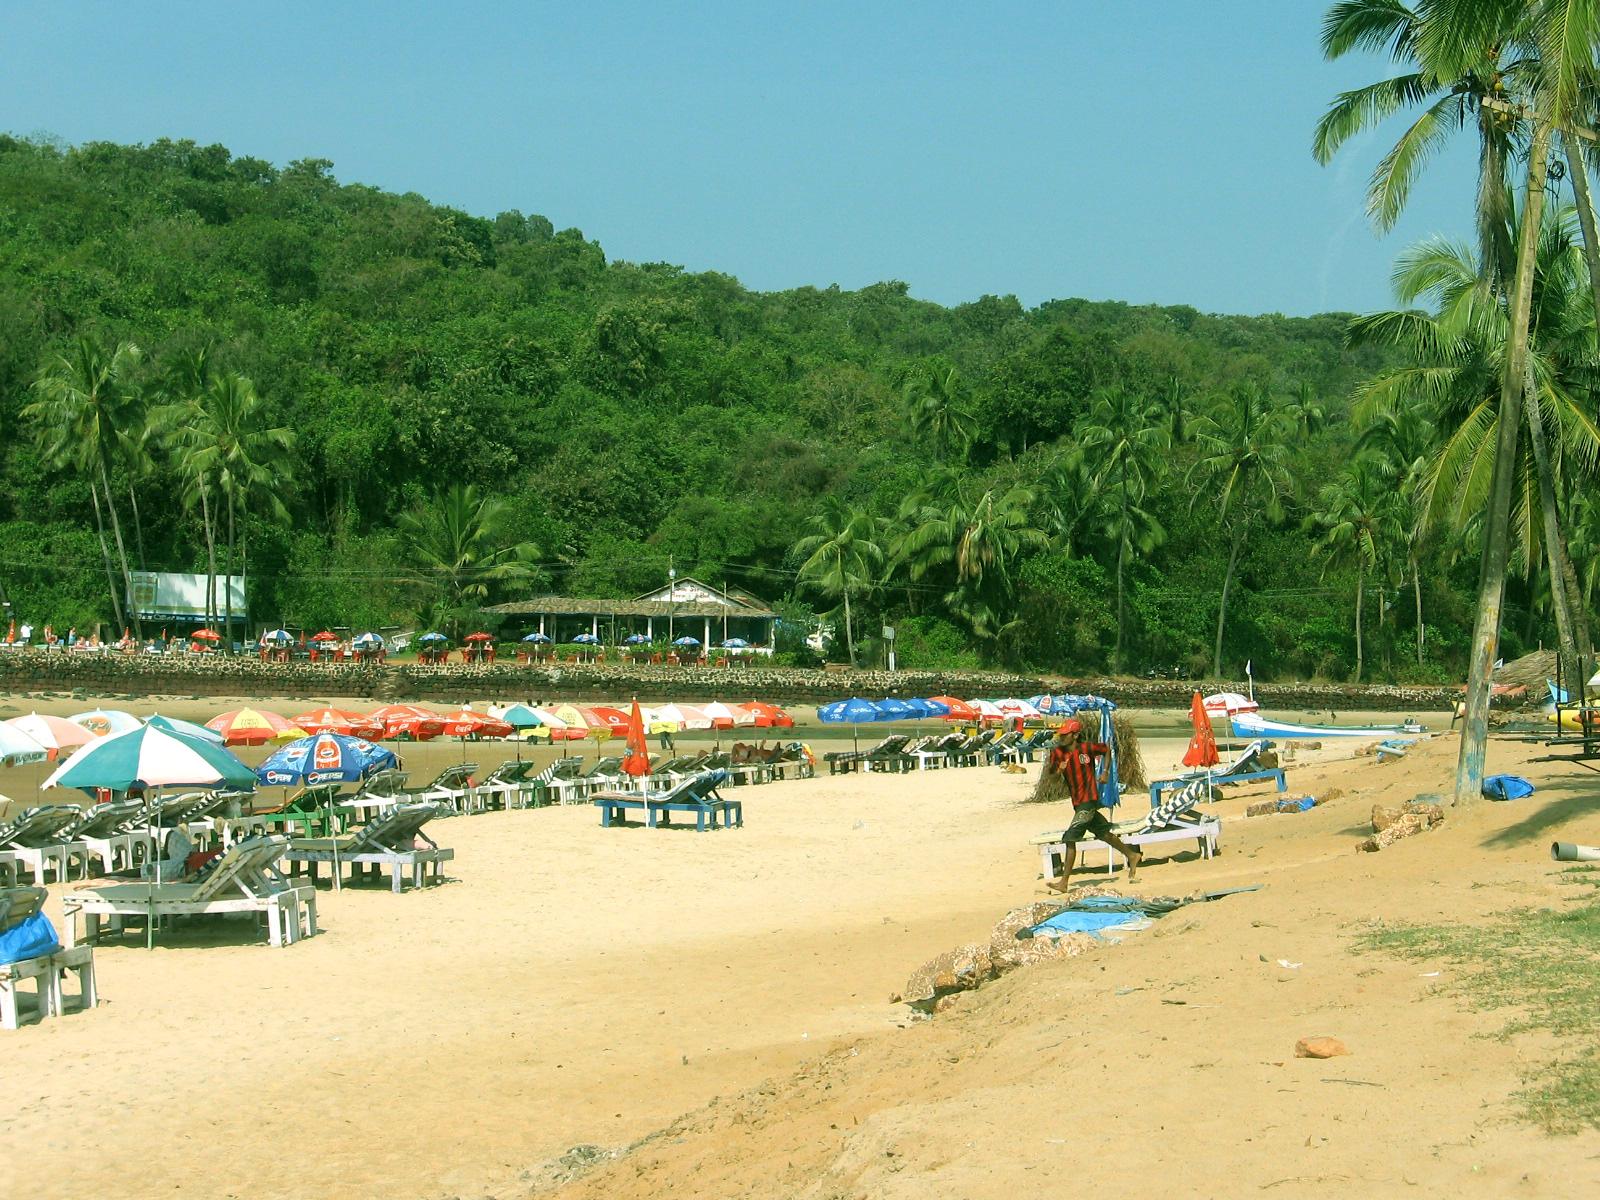 Бага, Индия отдых, пляжи, отели Баги от «Тонкостей туризма» 225